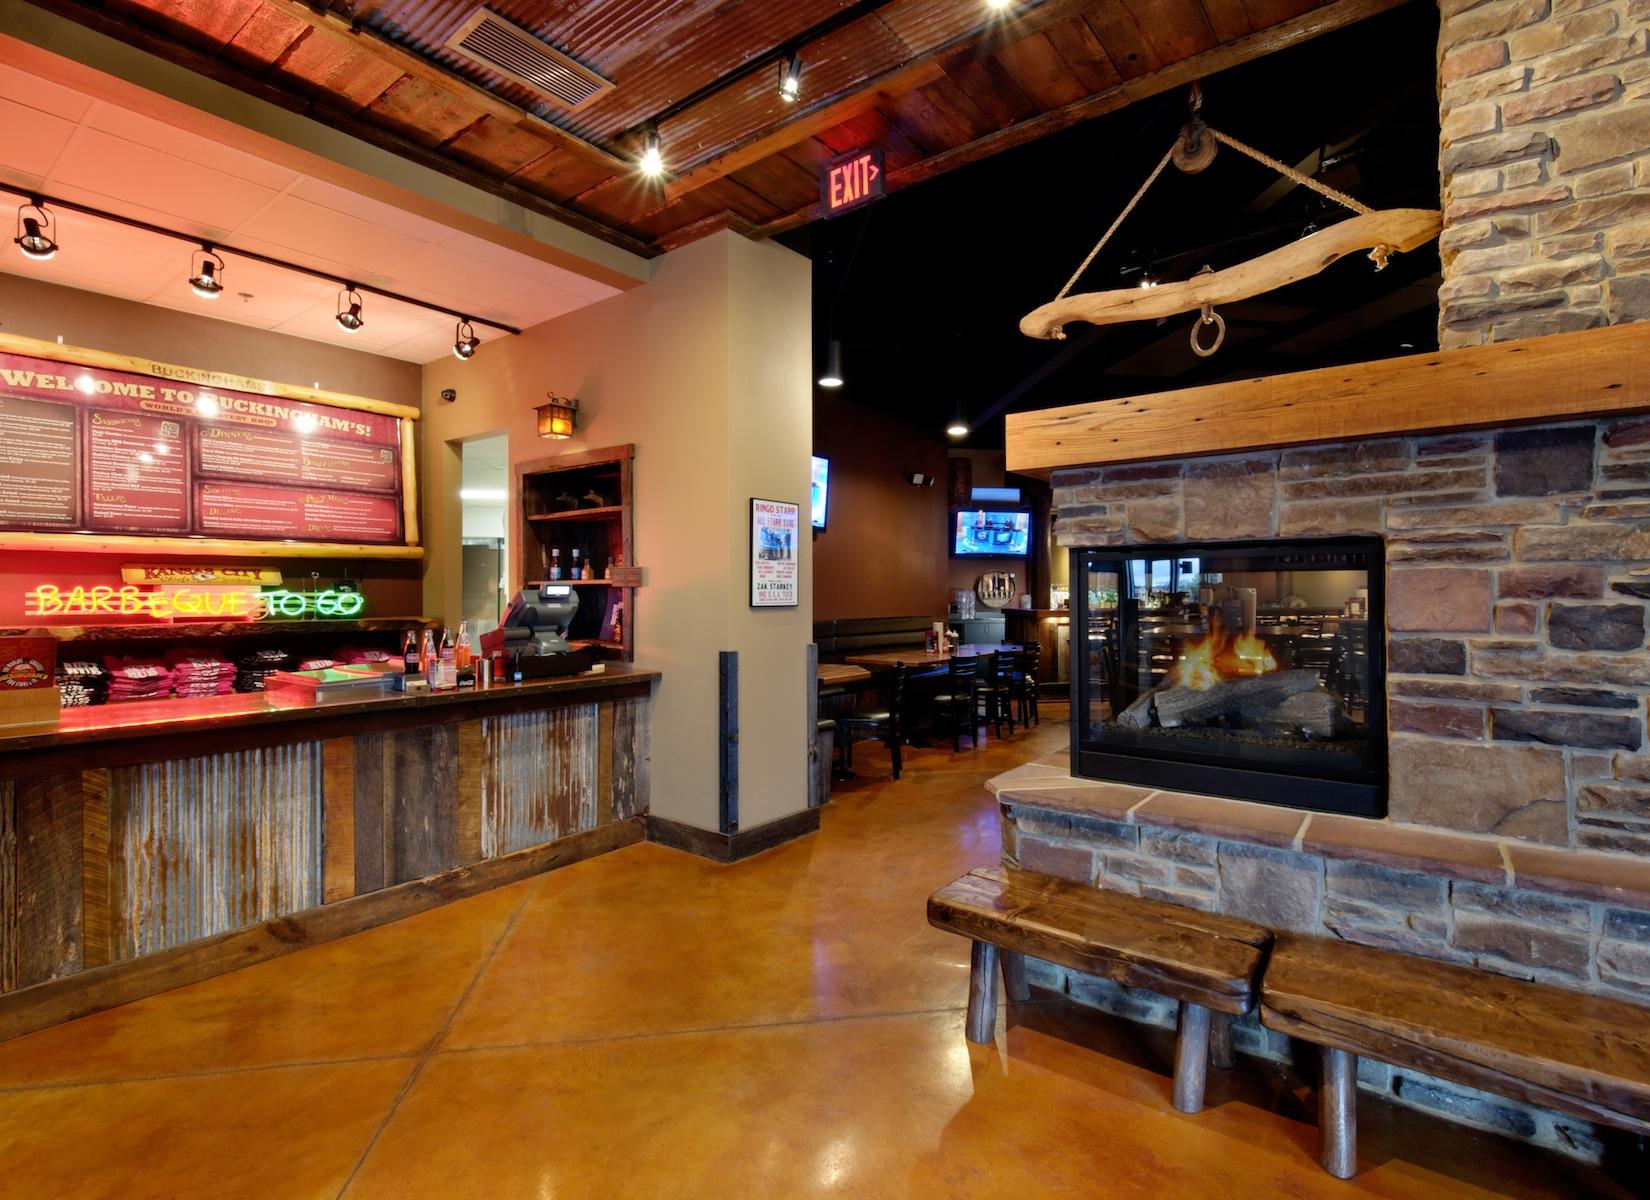 Bbq Restaurant Interior Design Ideas